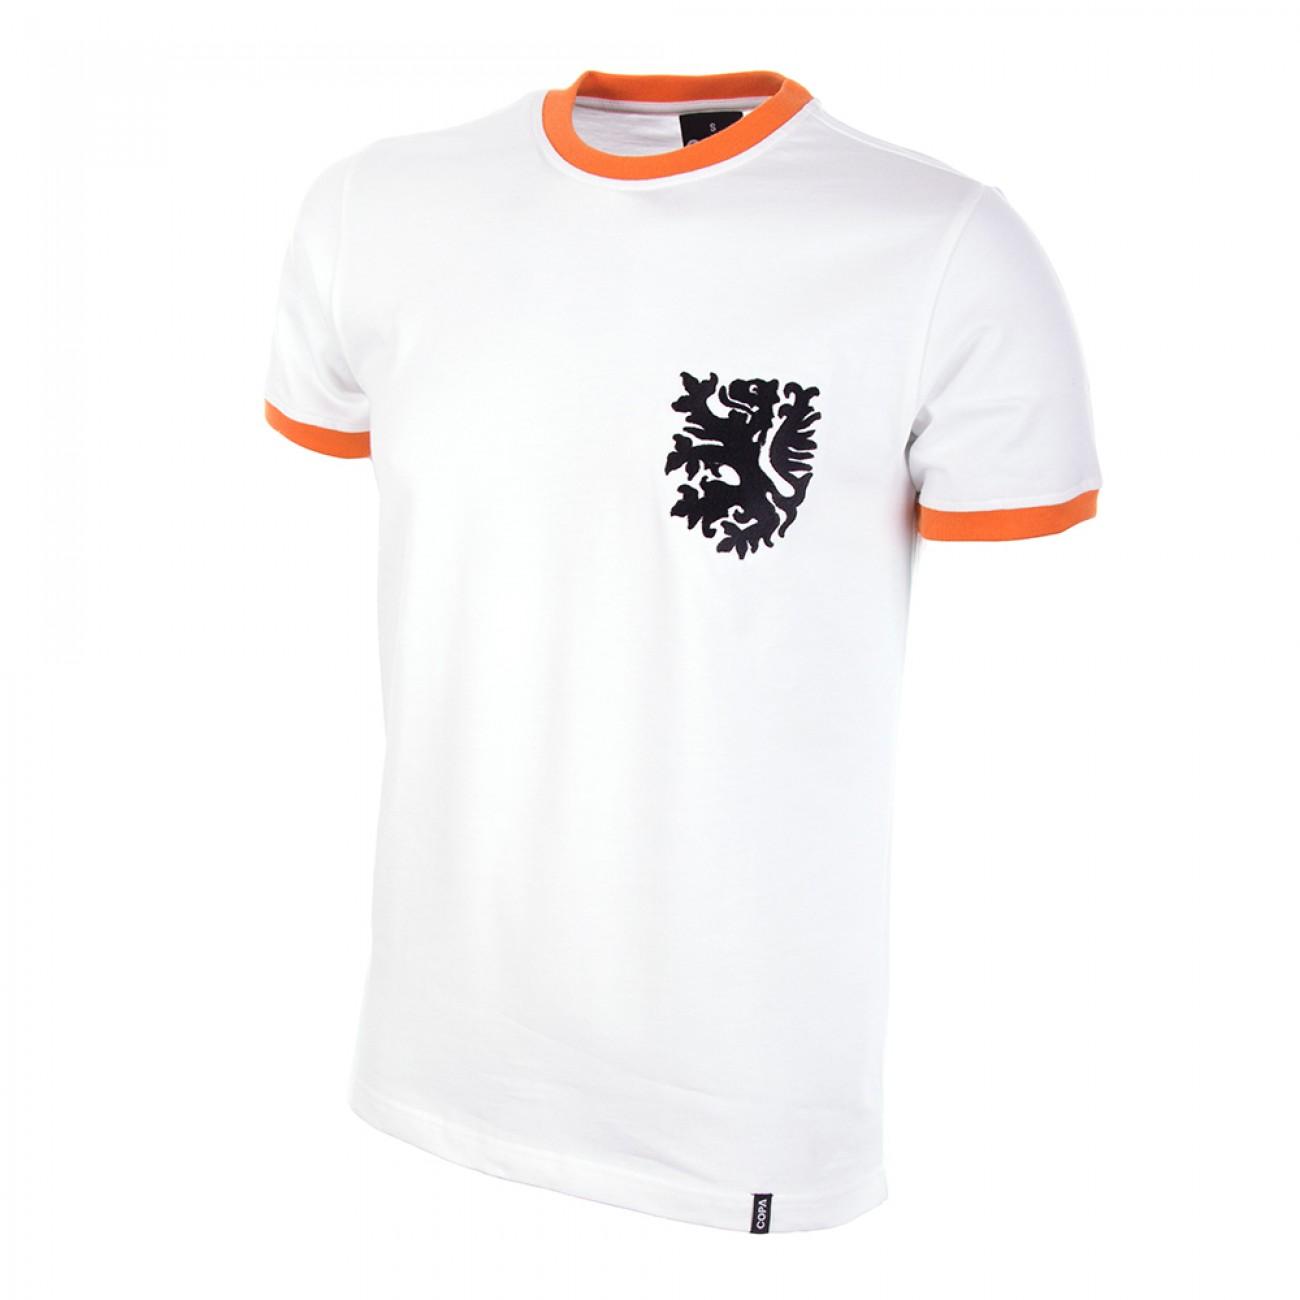 http://www.retrofootball.es/ropa-de-futbol/camiseta-holanda-a-os-70-blanca.html